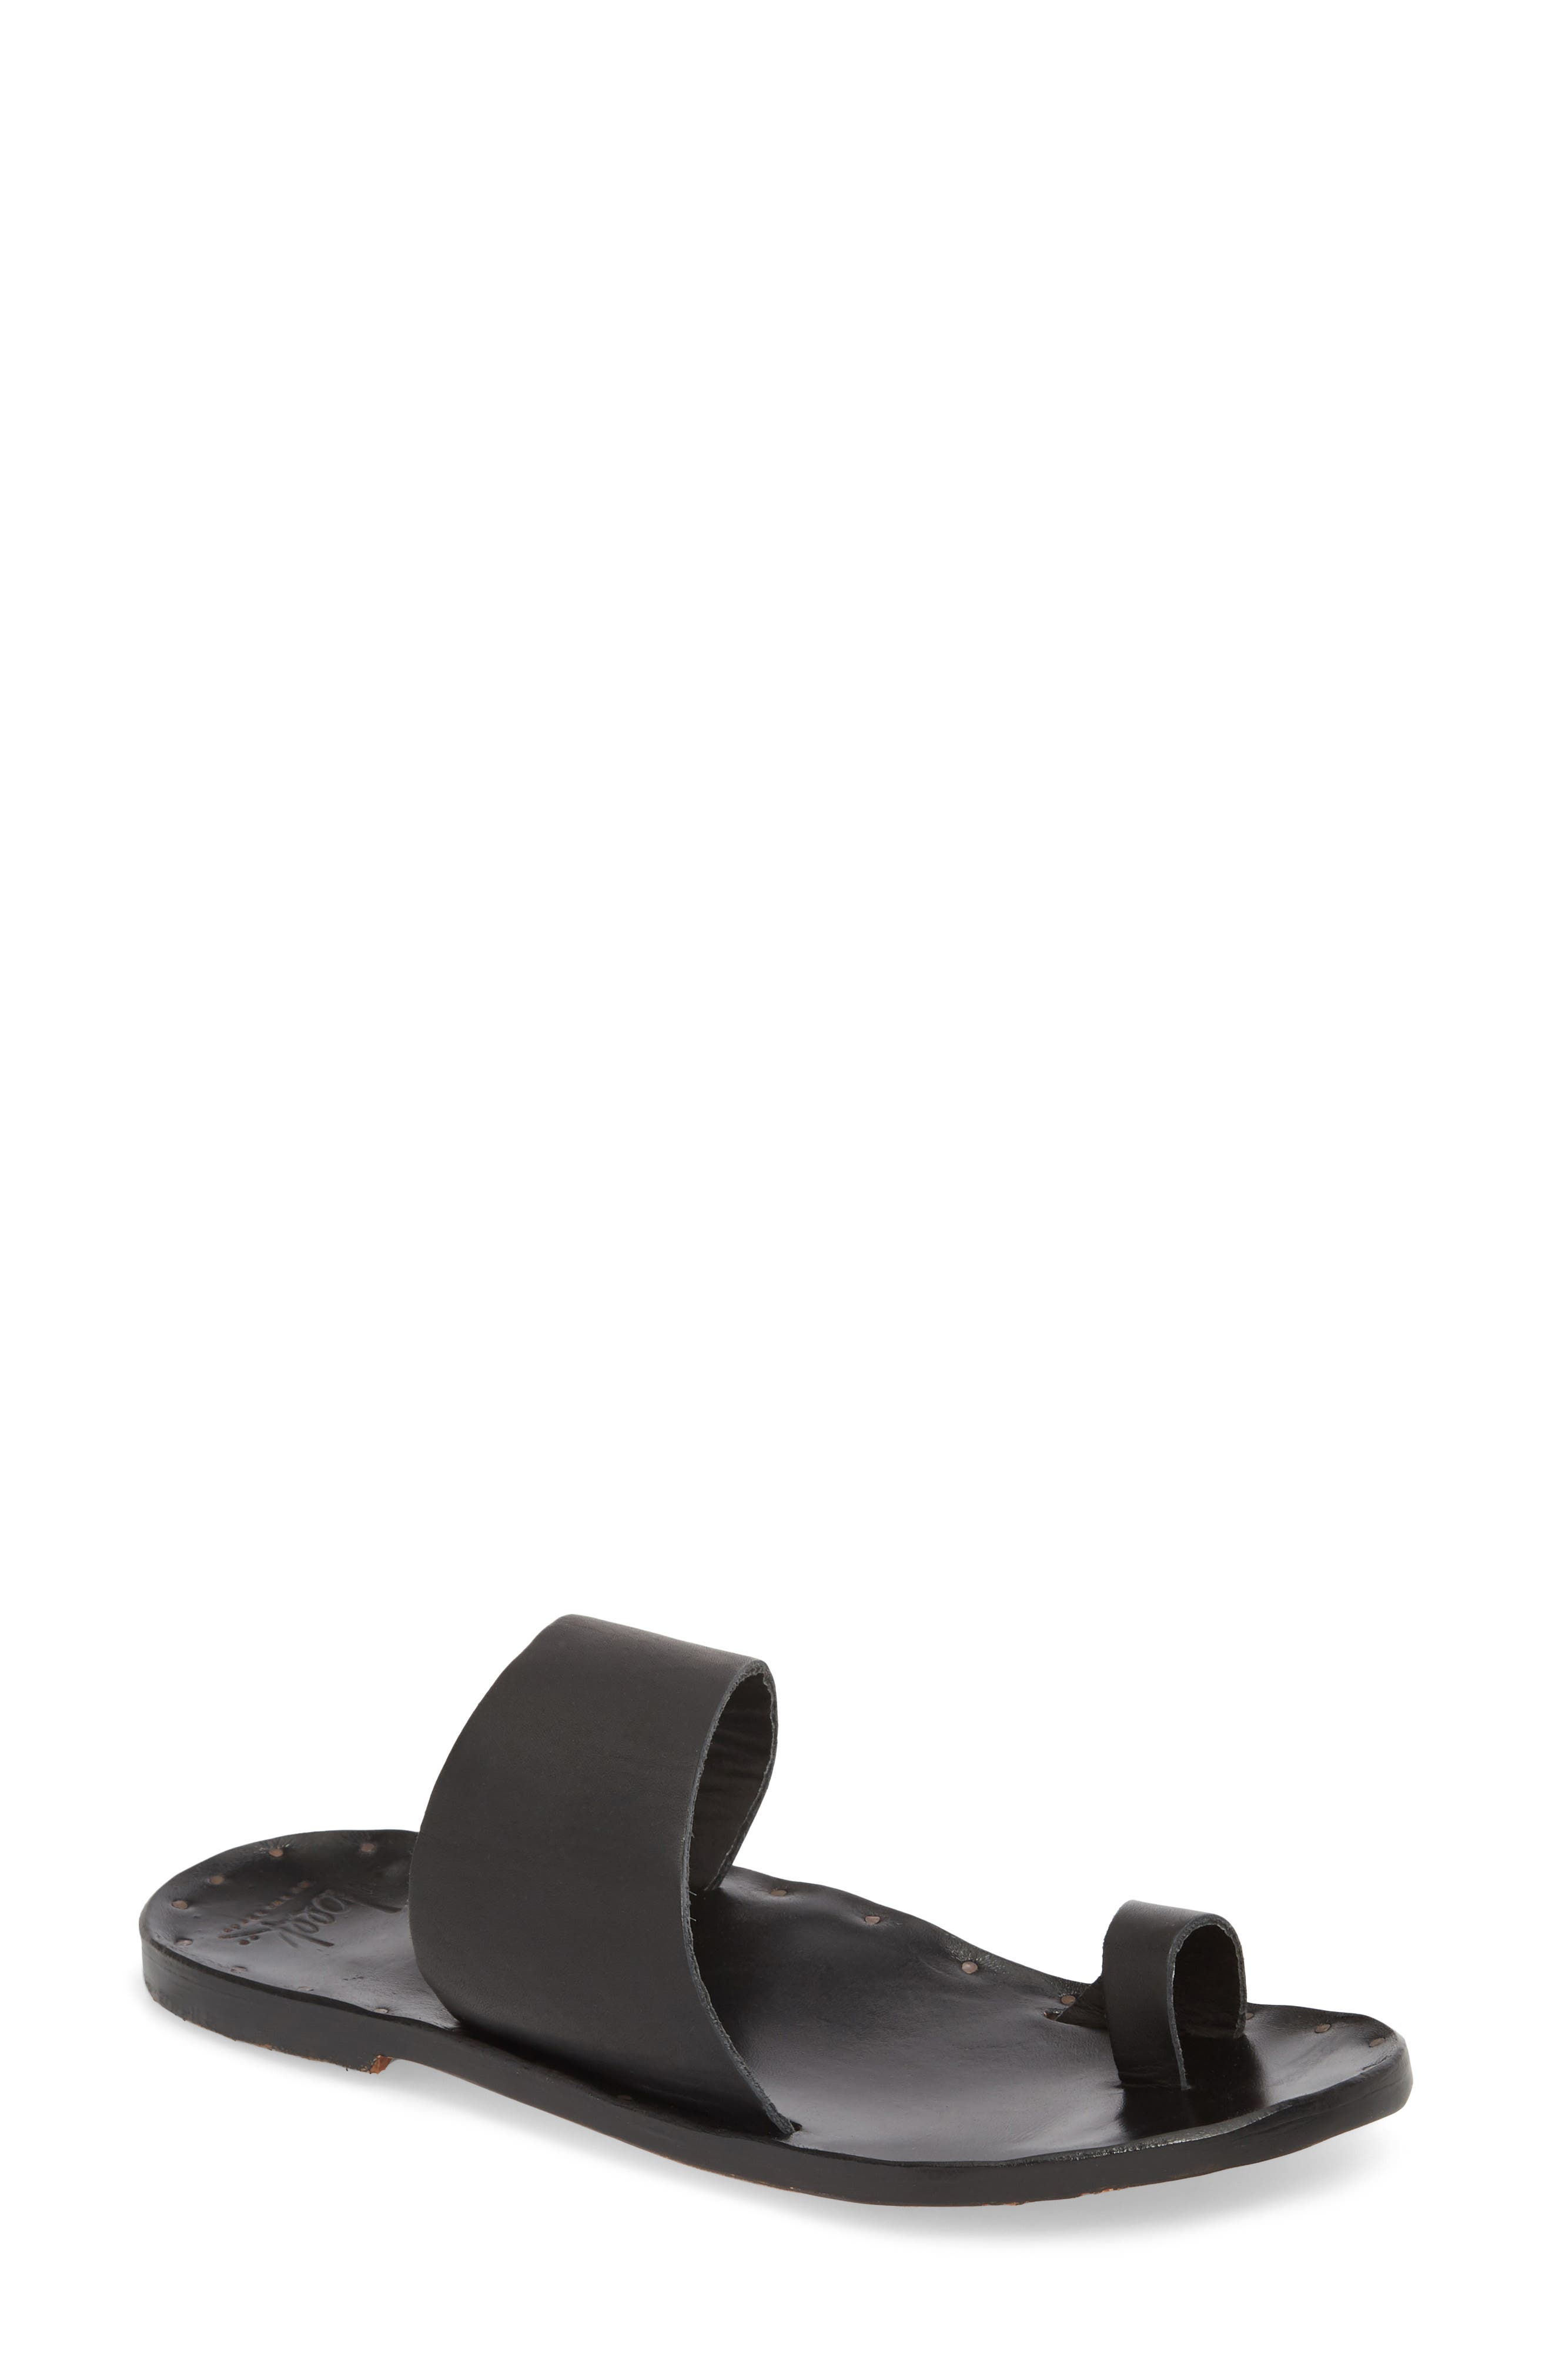 BEEK, Finch Sandal, Main thumbnail 1, color, BLACK/ BLACK